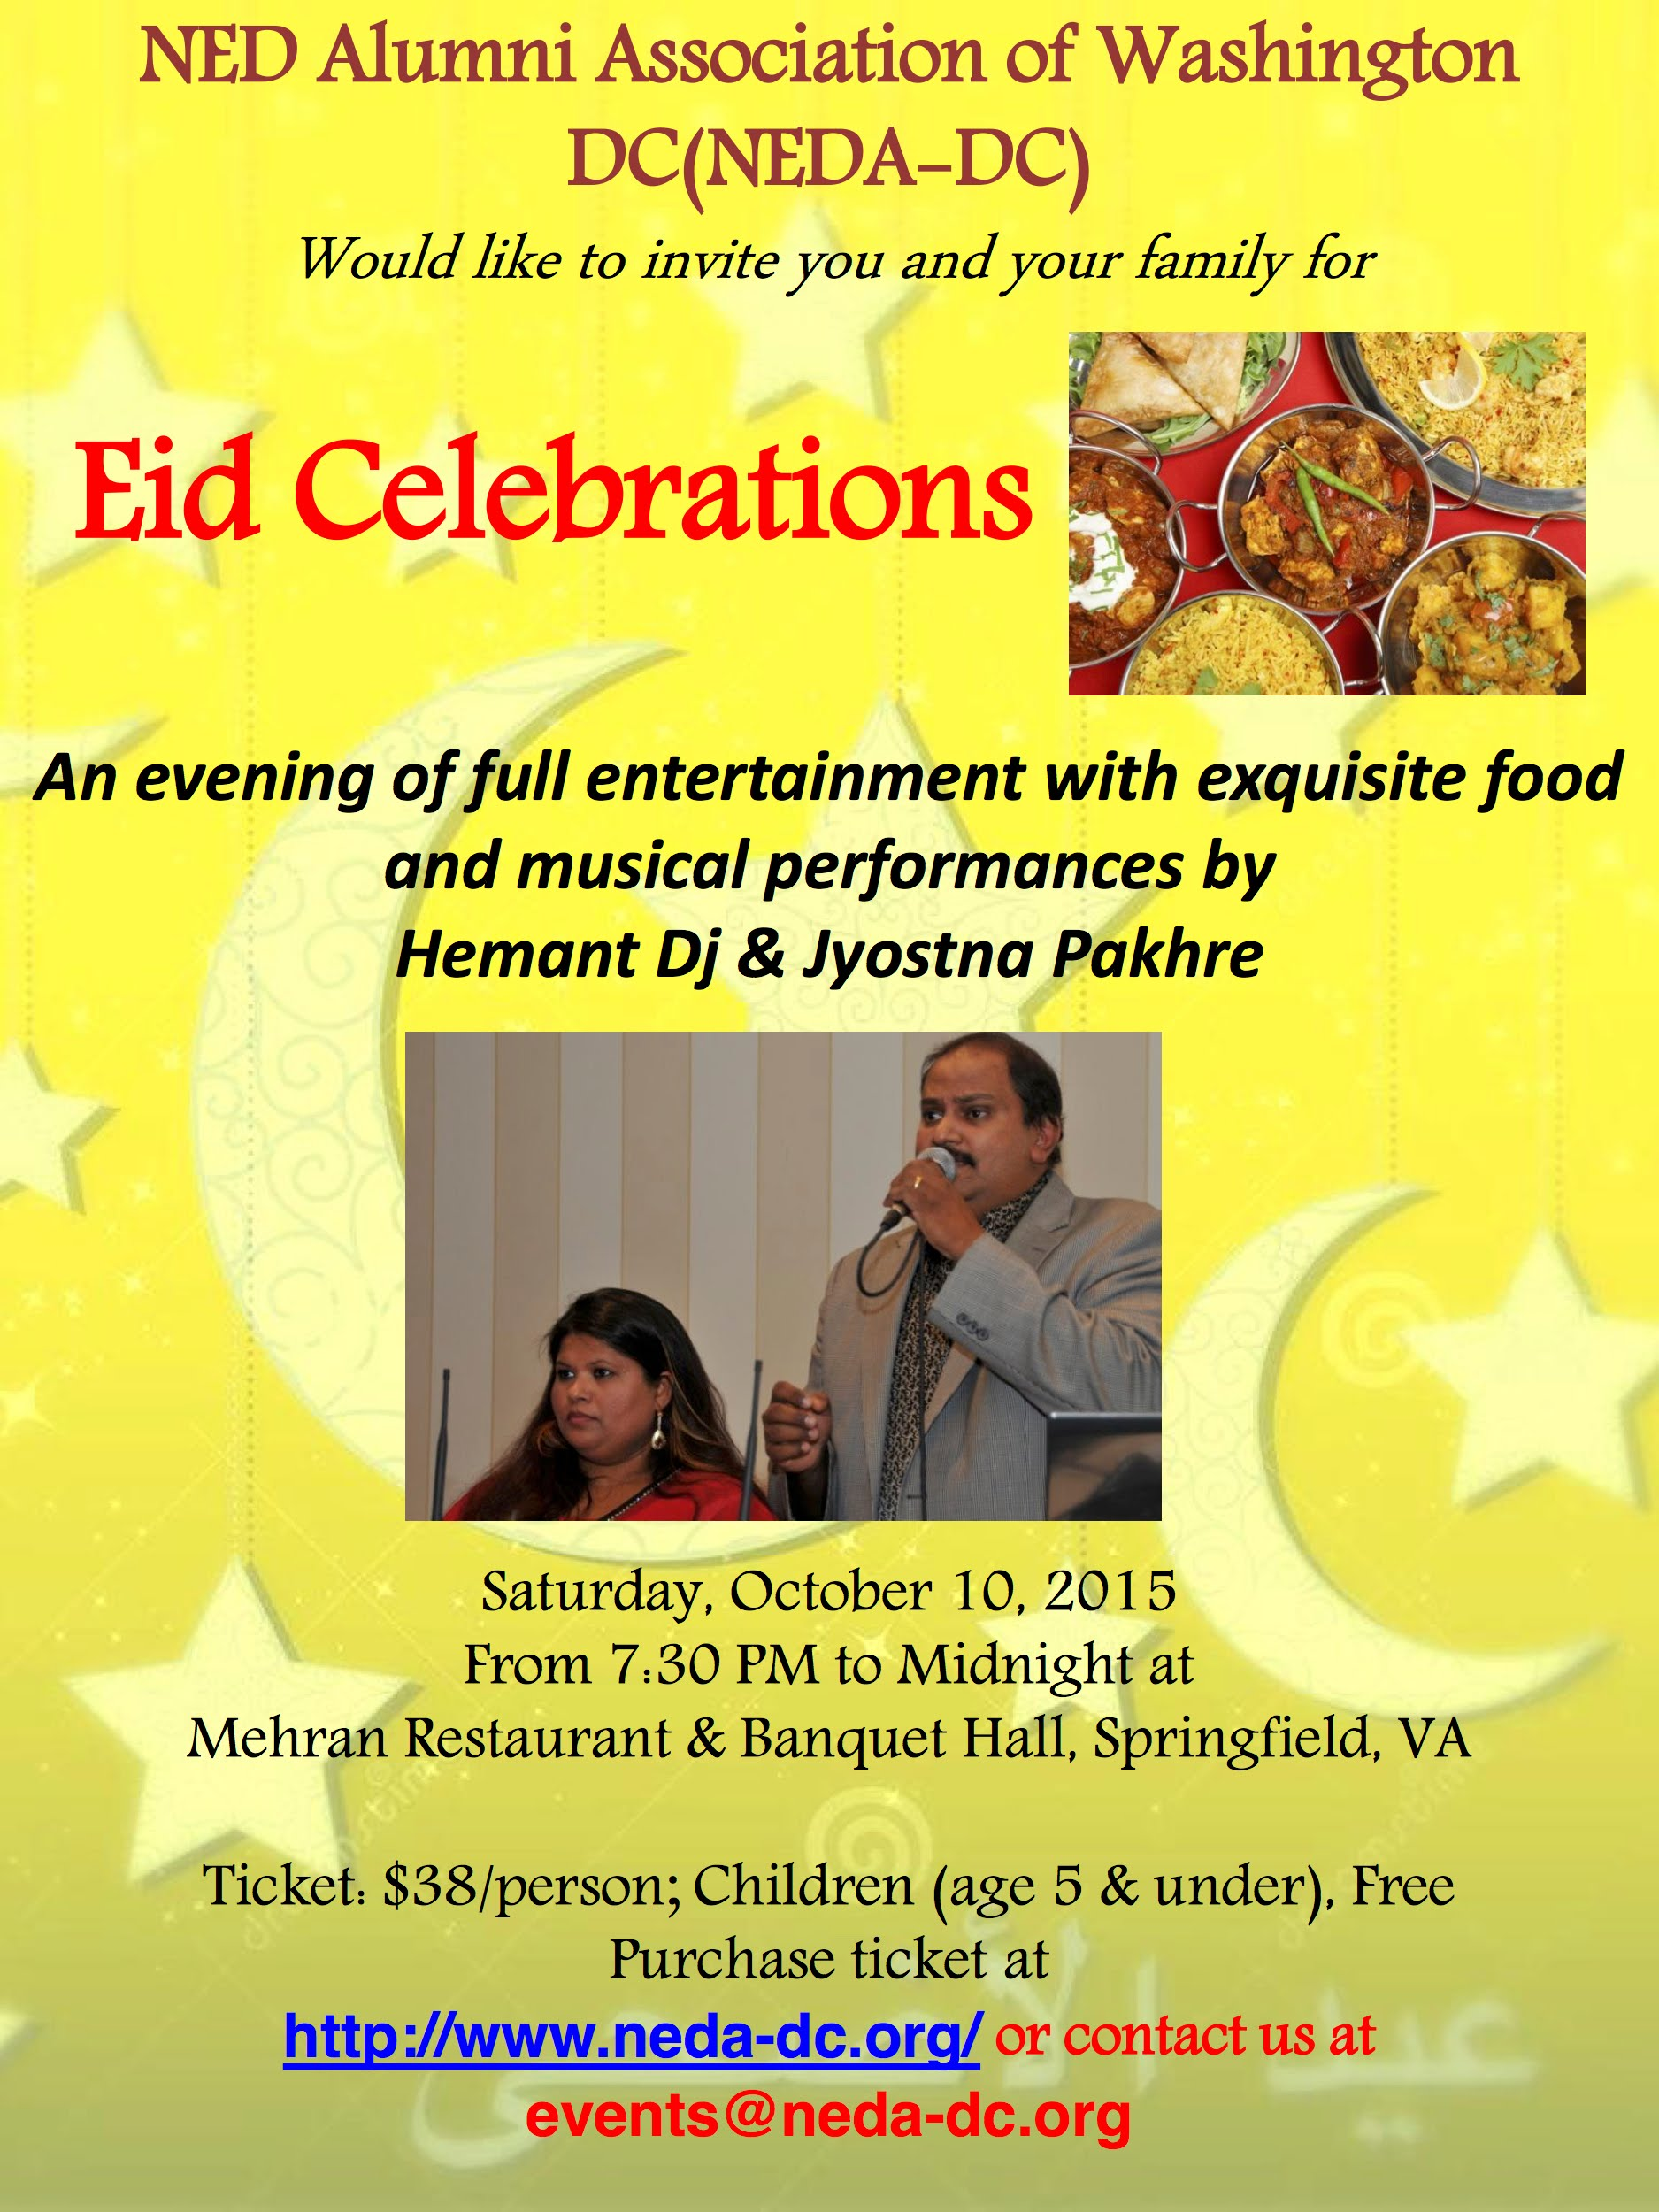 Eid-ul-Azha Celebration 2015